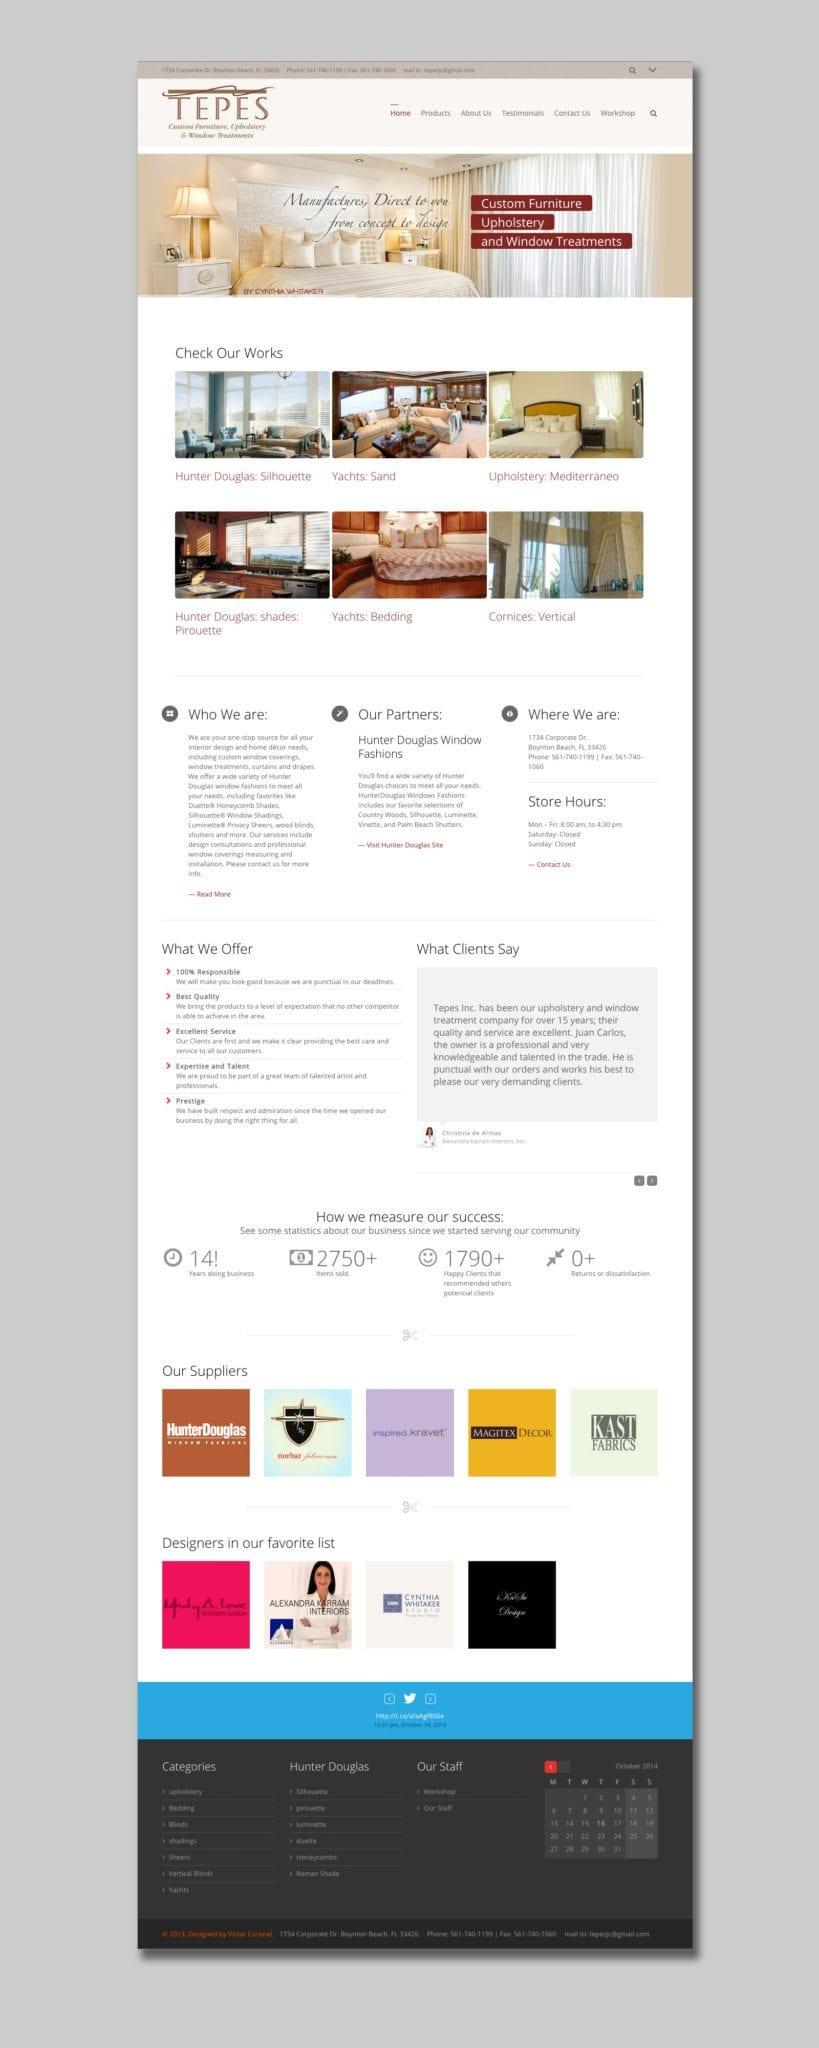 Tepes Web Site Mockup